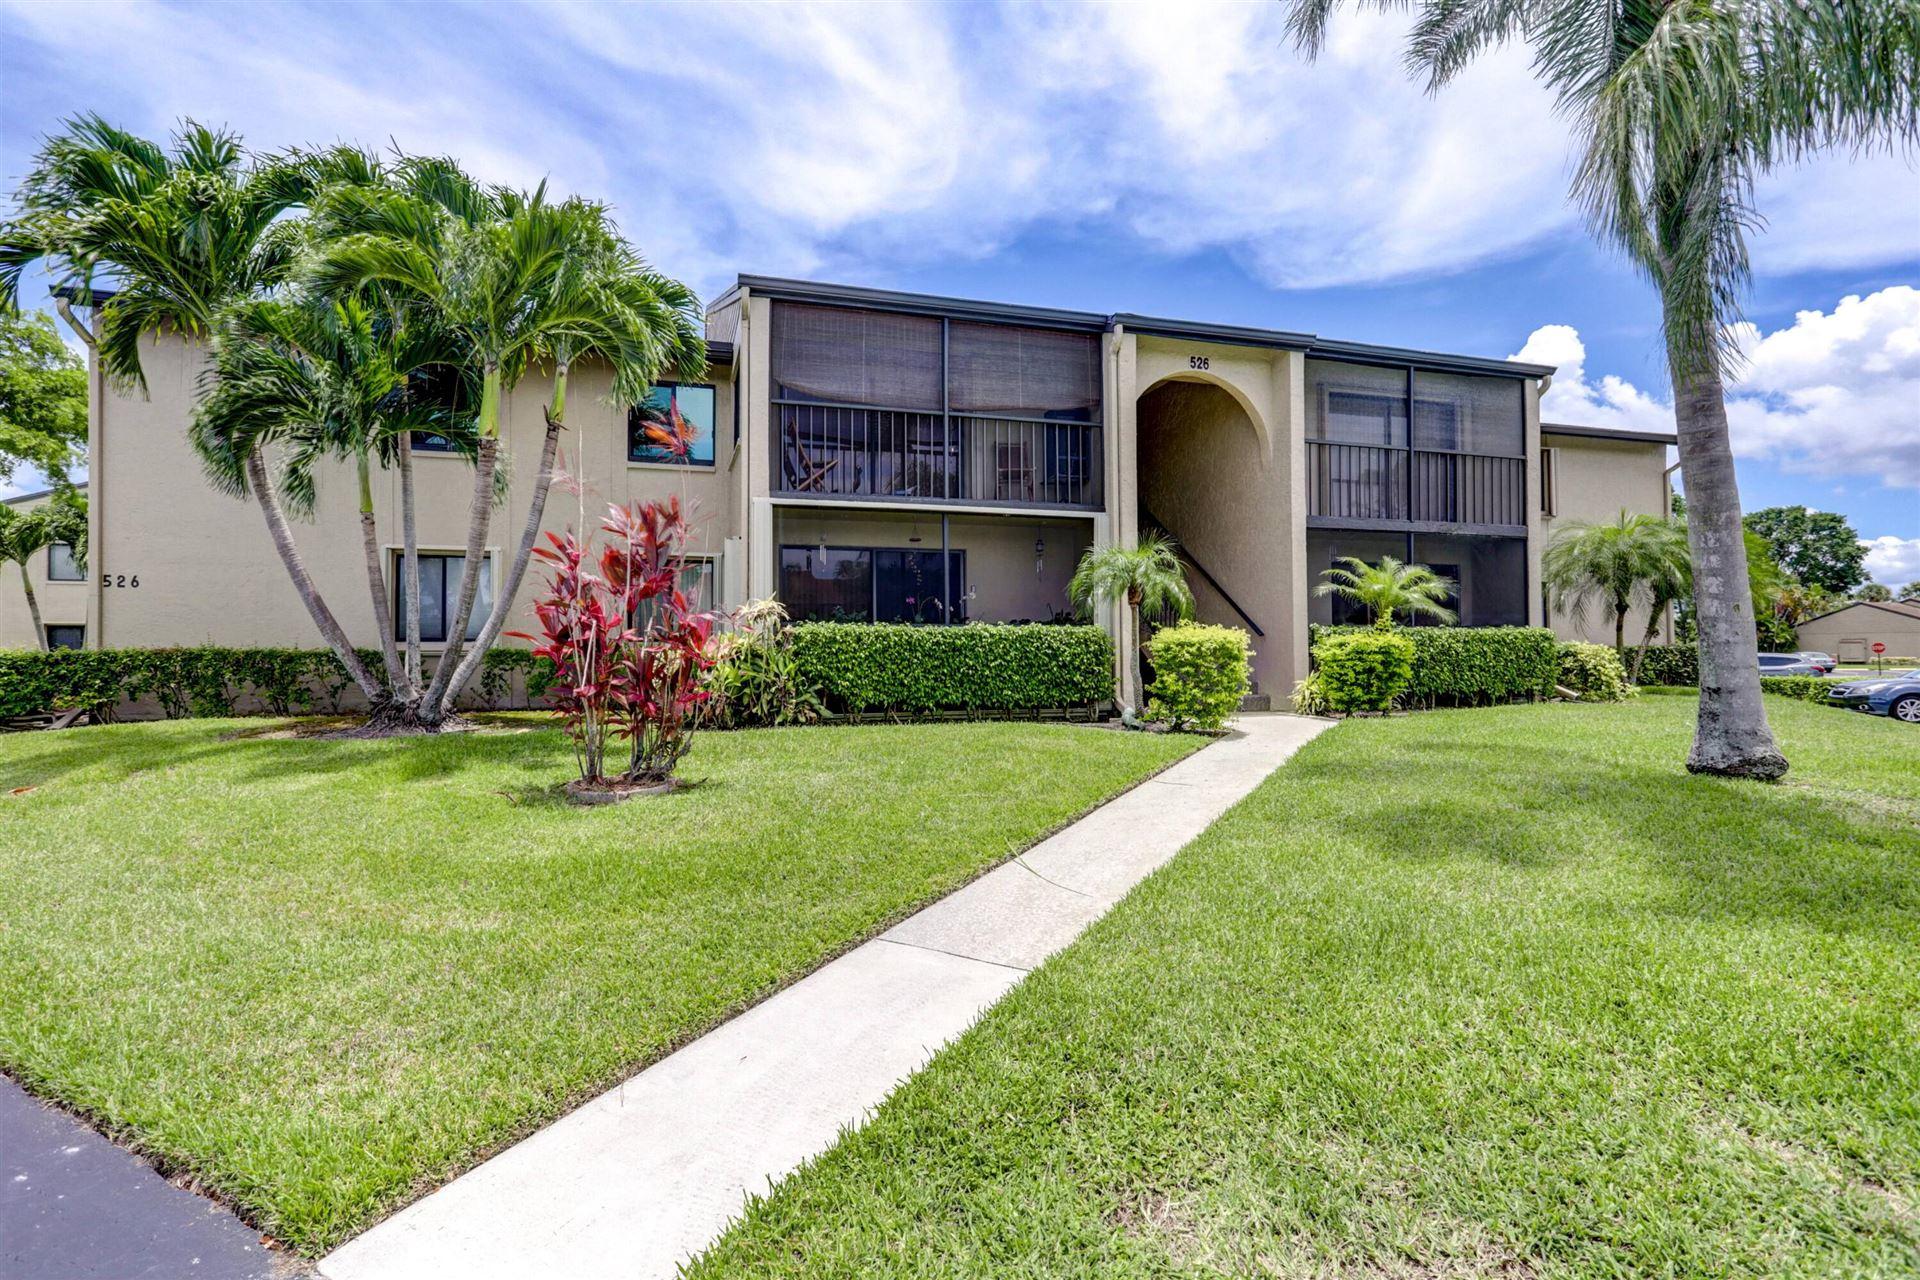 526 Shady Pine Way #D2, Greenacres, FL 33415 - MLS#: RX-10715415